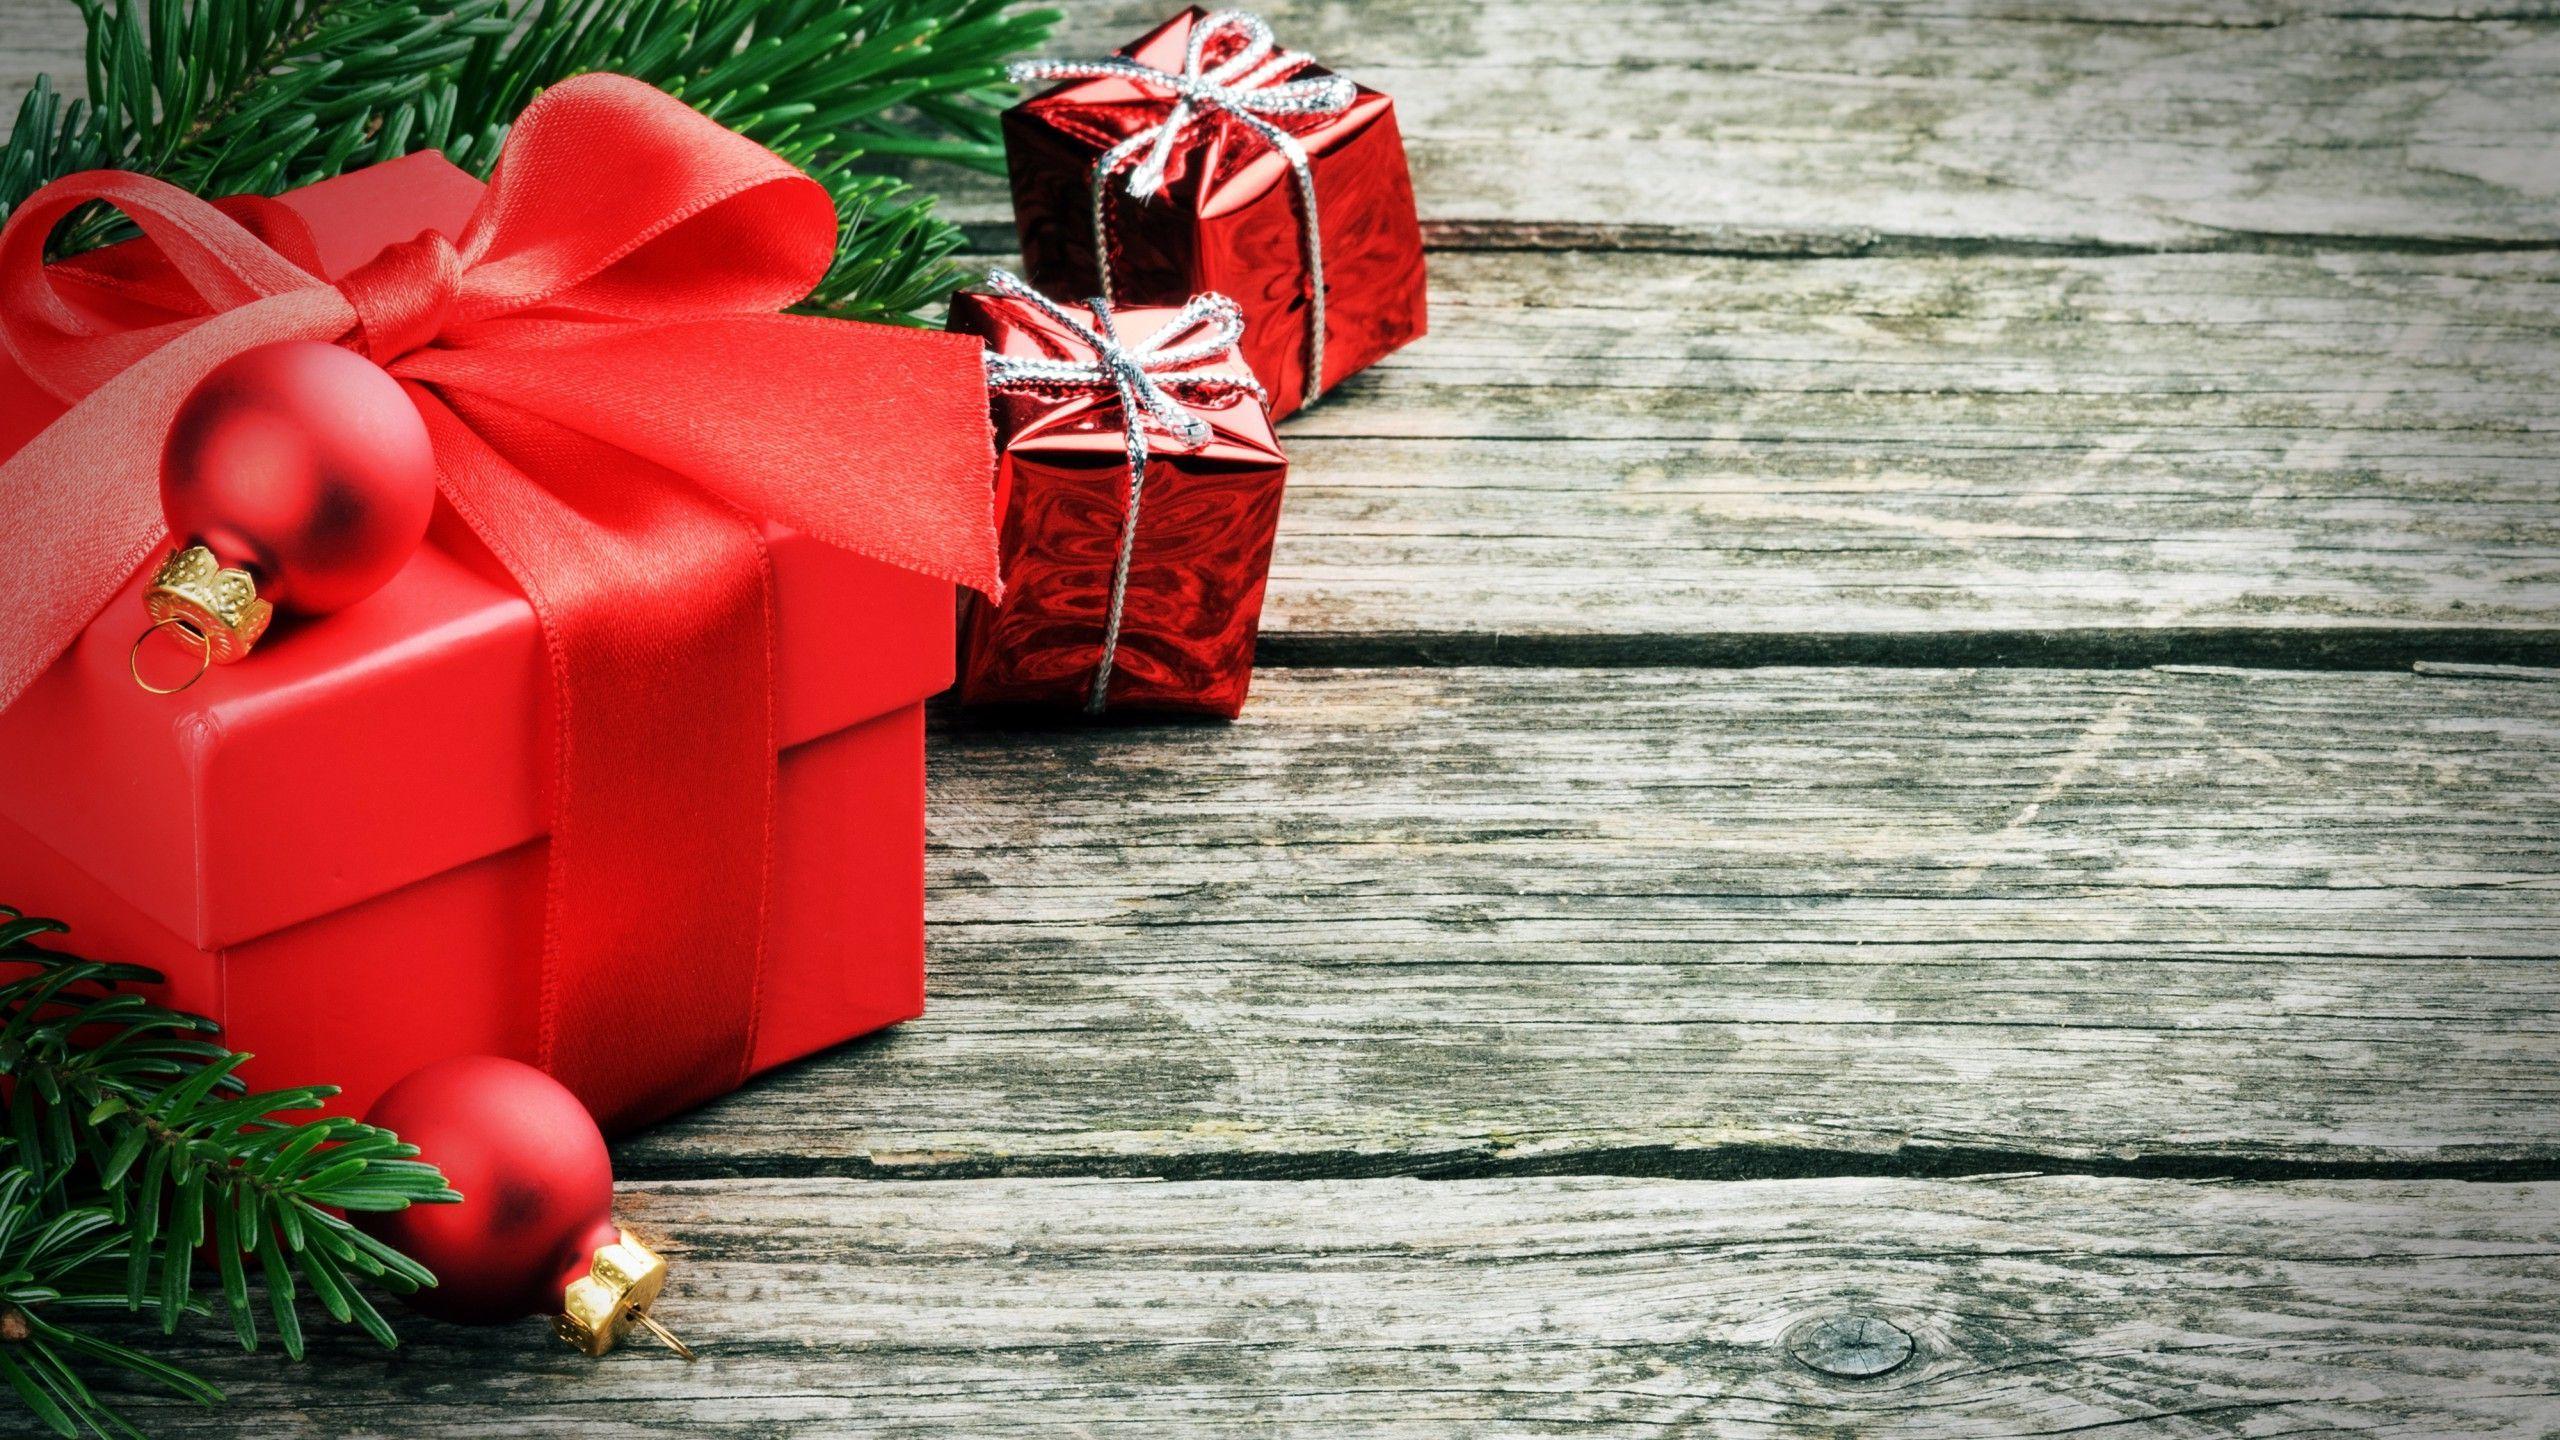 Christmas Presents Xmas Present 1200x675 Download Hd Wallpaper Wallpapertip